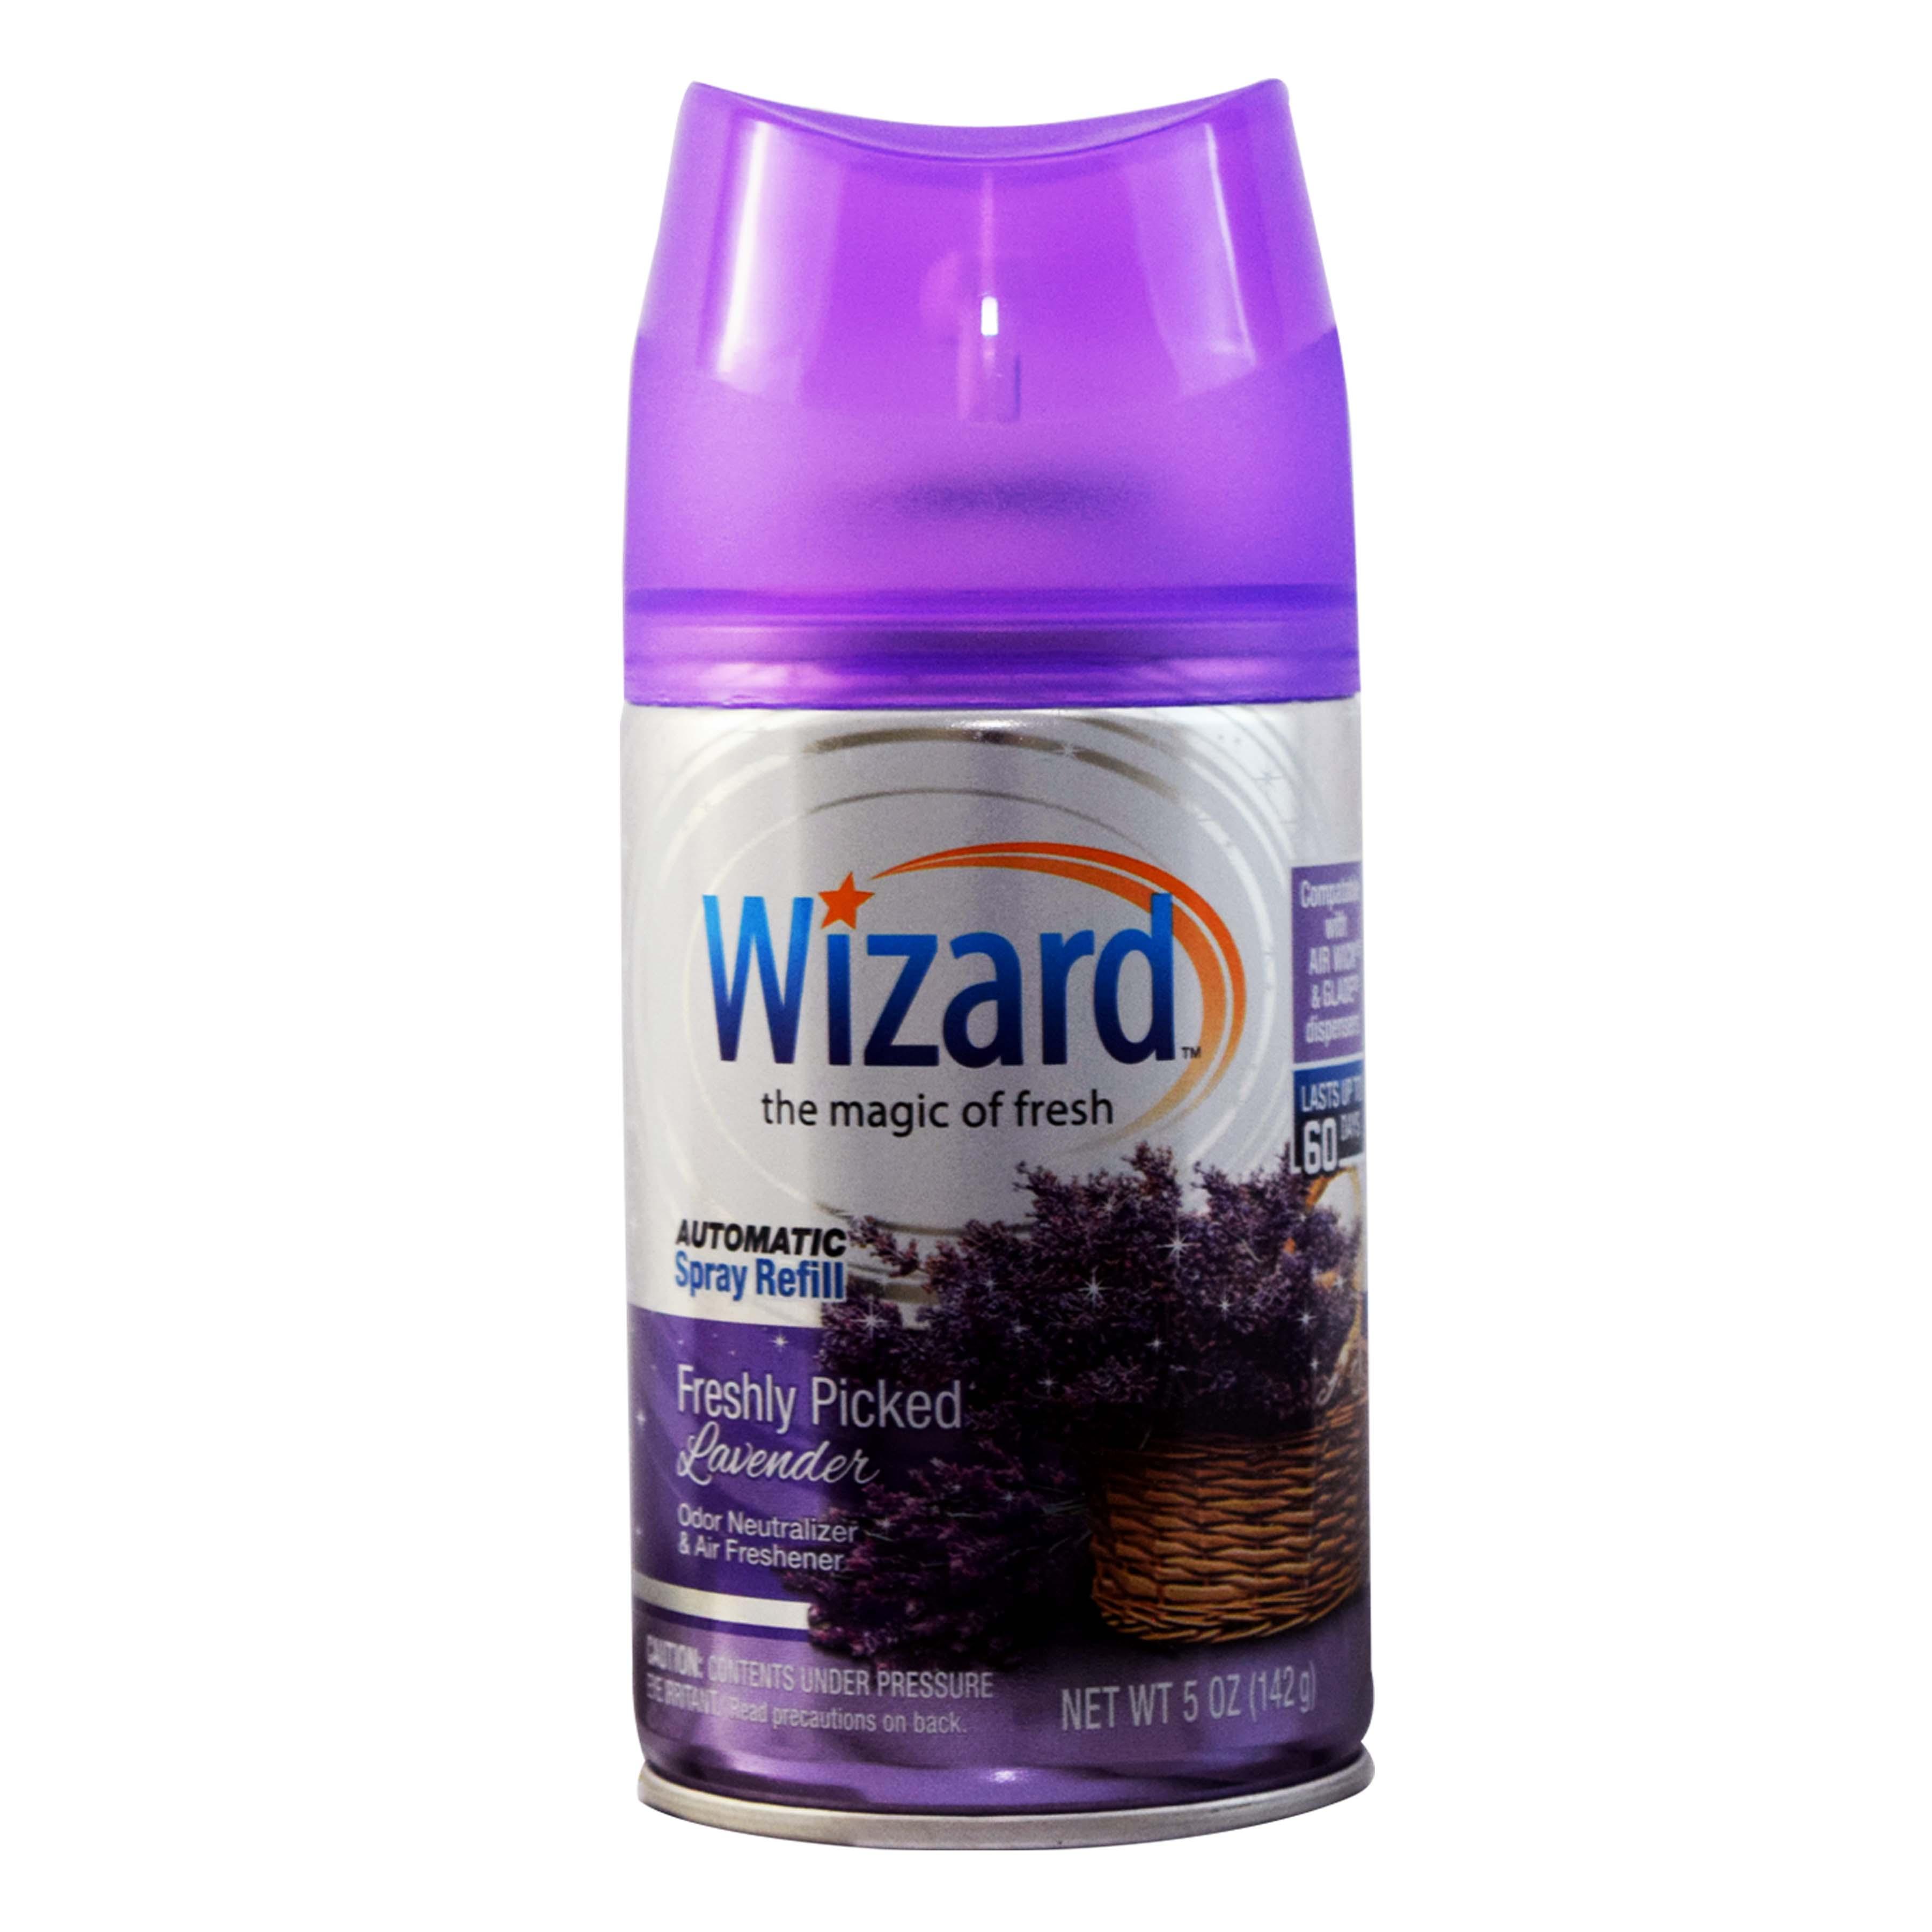 Wizard 5 oz. Automatic Spray Refills, Freshly Picked Lavender